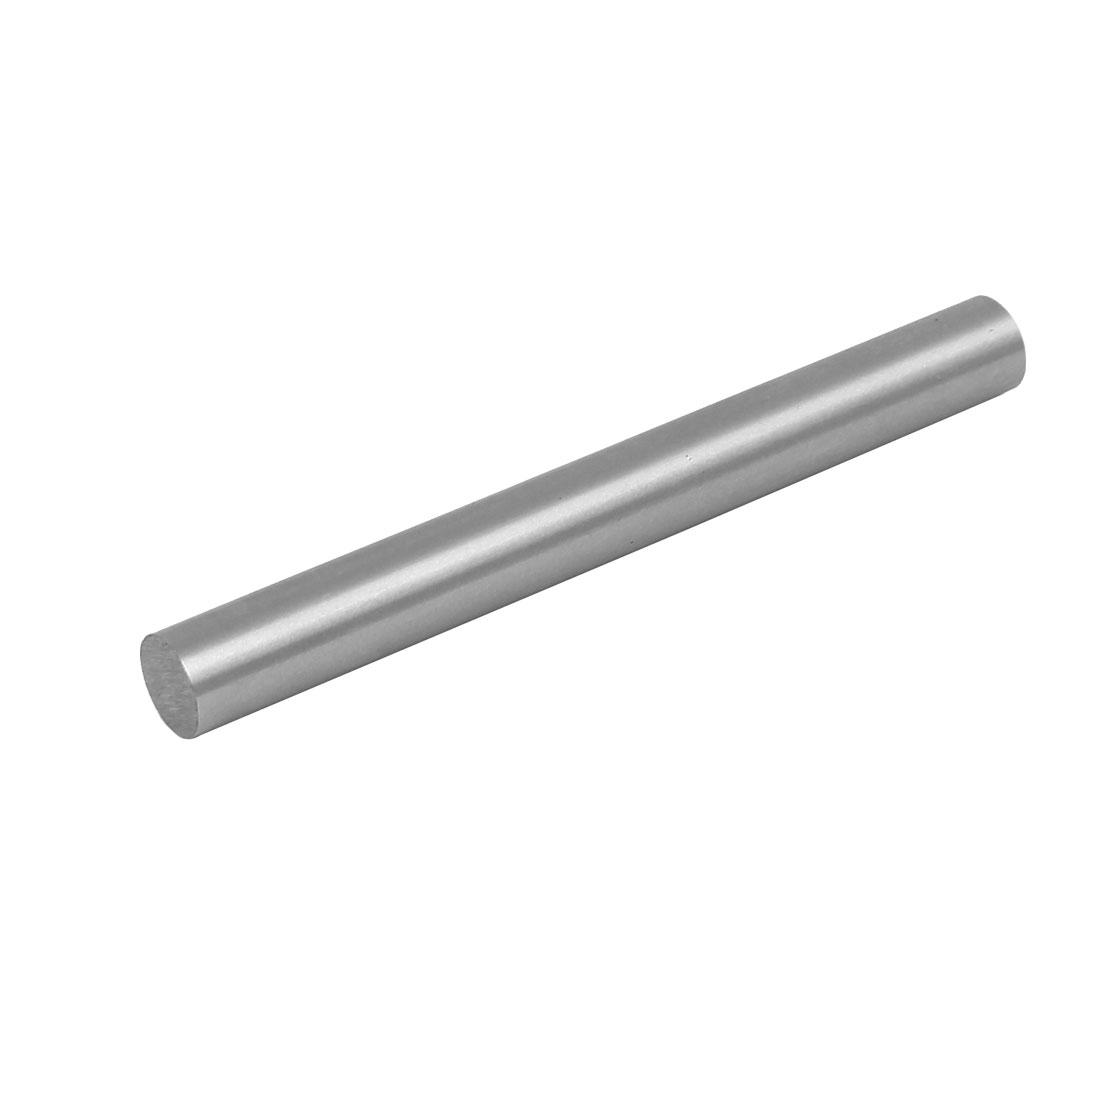 10.5mm Dia 100mm Length HSS Round Shaft Rod Bar Lathe Tools Gray